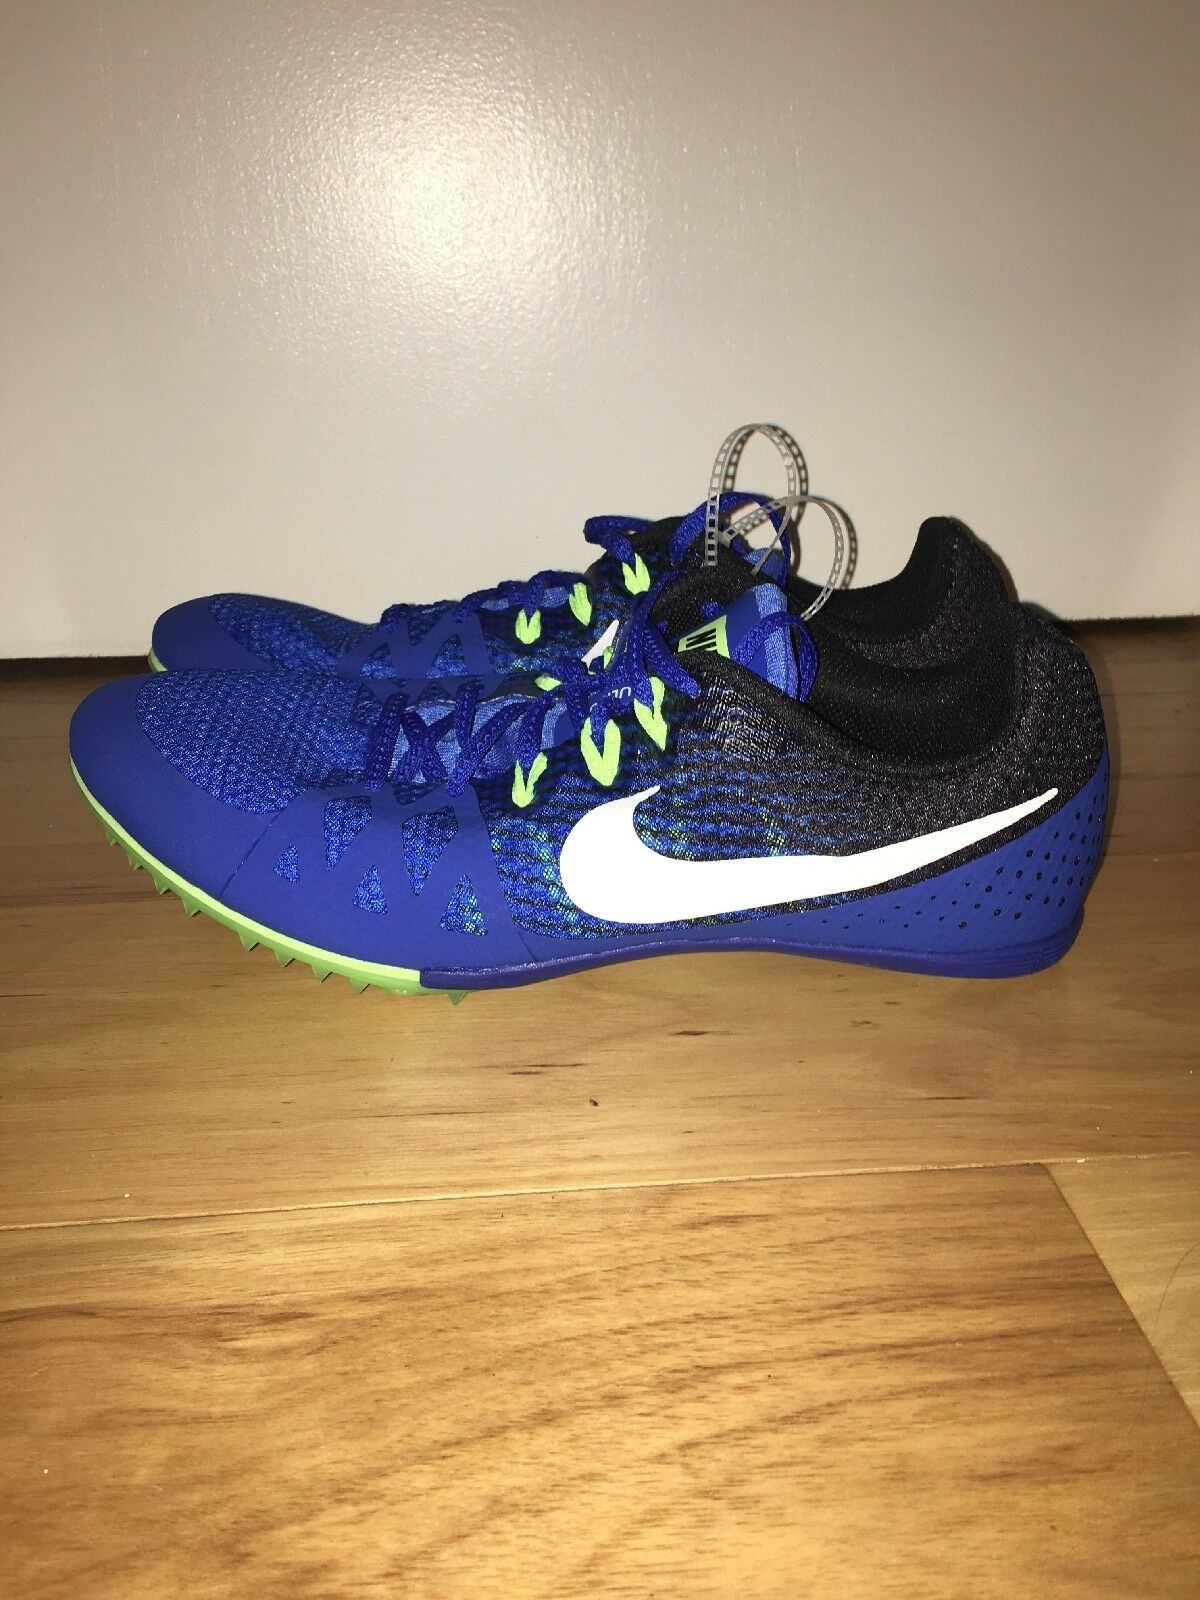 Nike hombre rival zapatos Spikes pista Nike Zoom rival hombre M8 Racing cómodo 1bd419